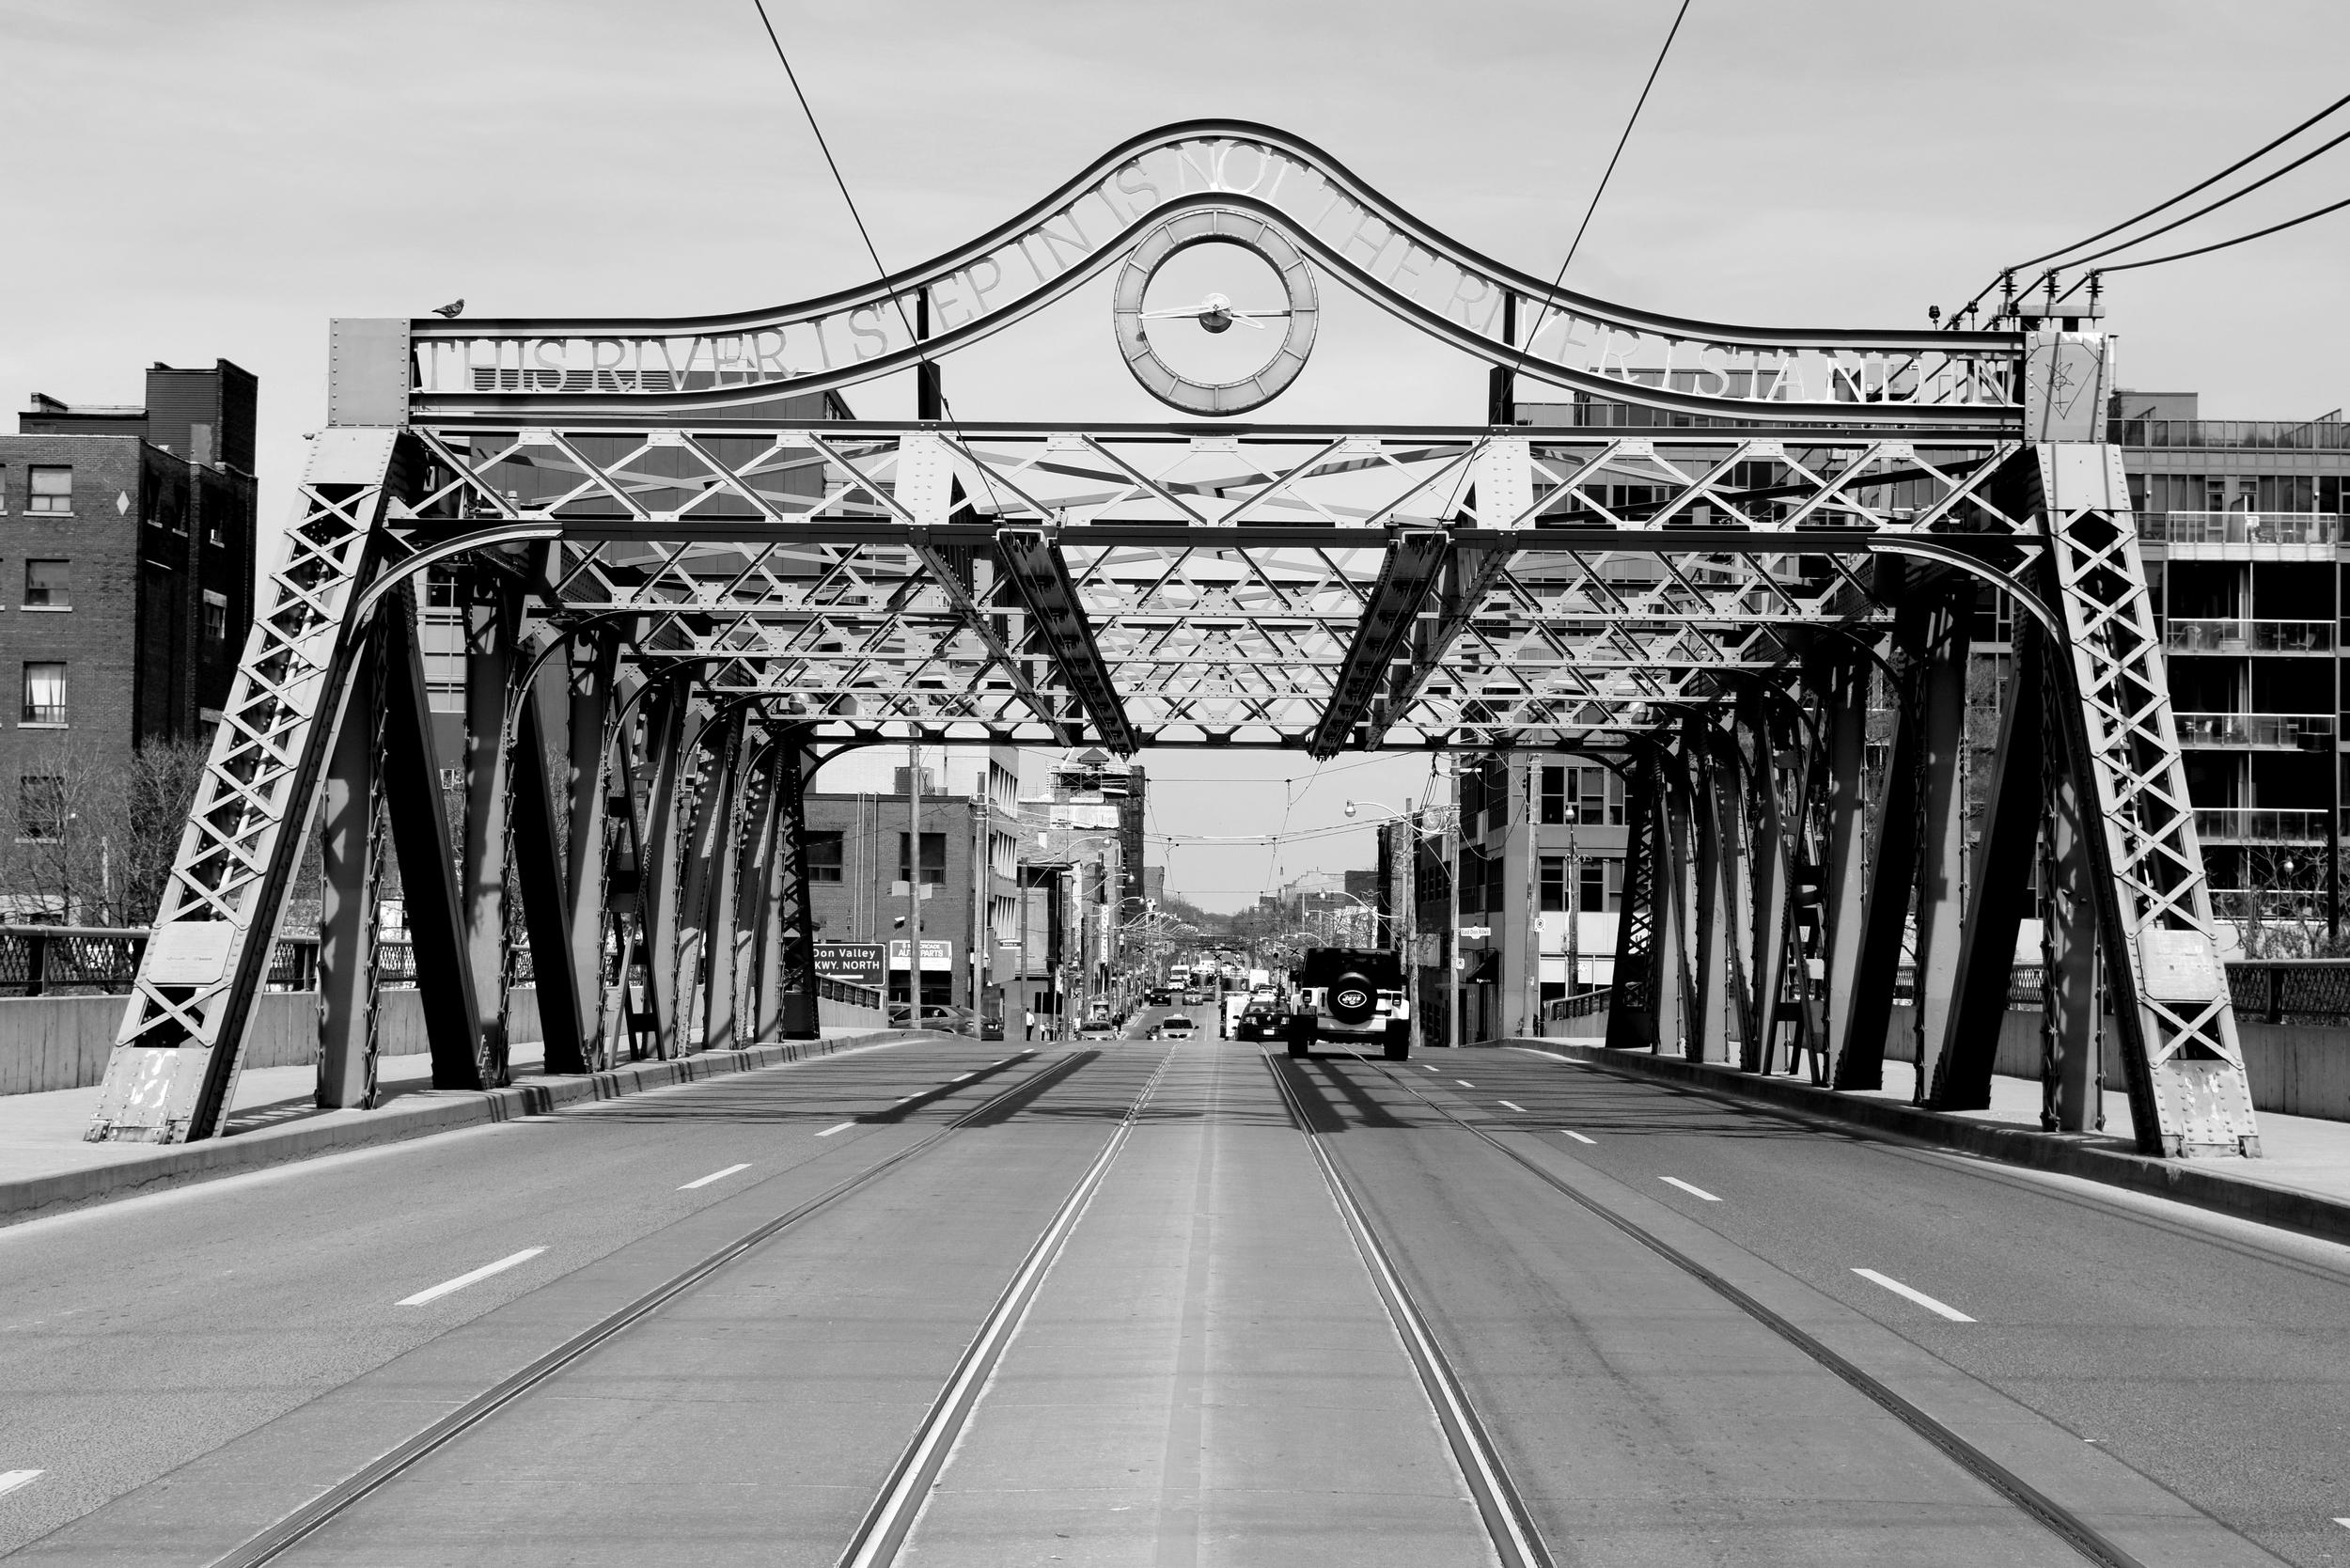 Queen Street Viaduct (photograph by John Severino)